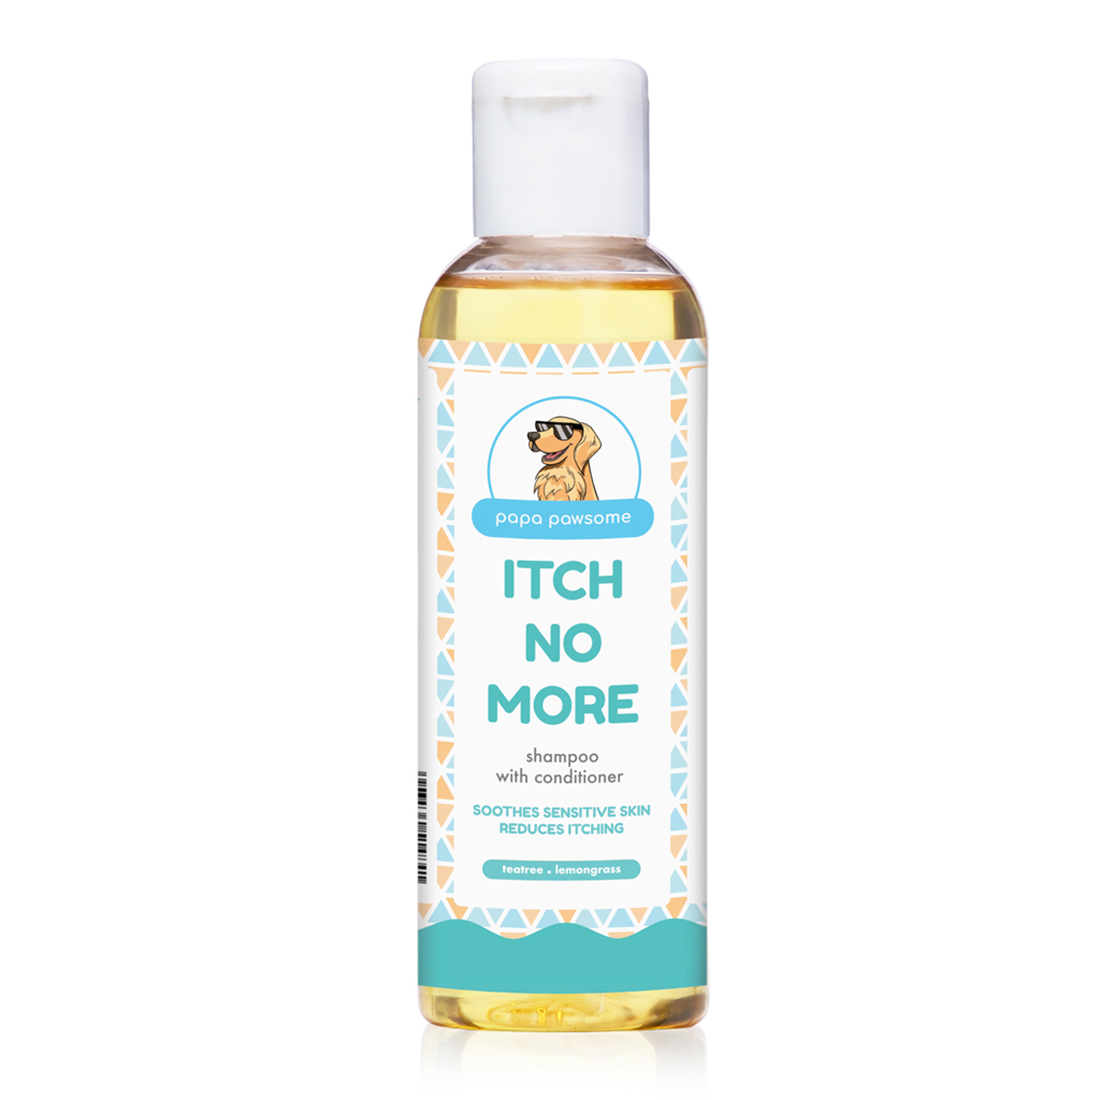 Papa Pawsome Itch No More Shampoo with Conditioner for Dog - 250 ml